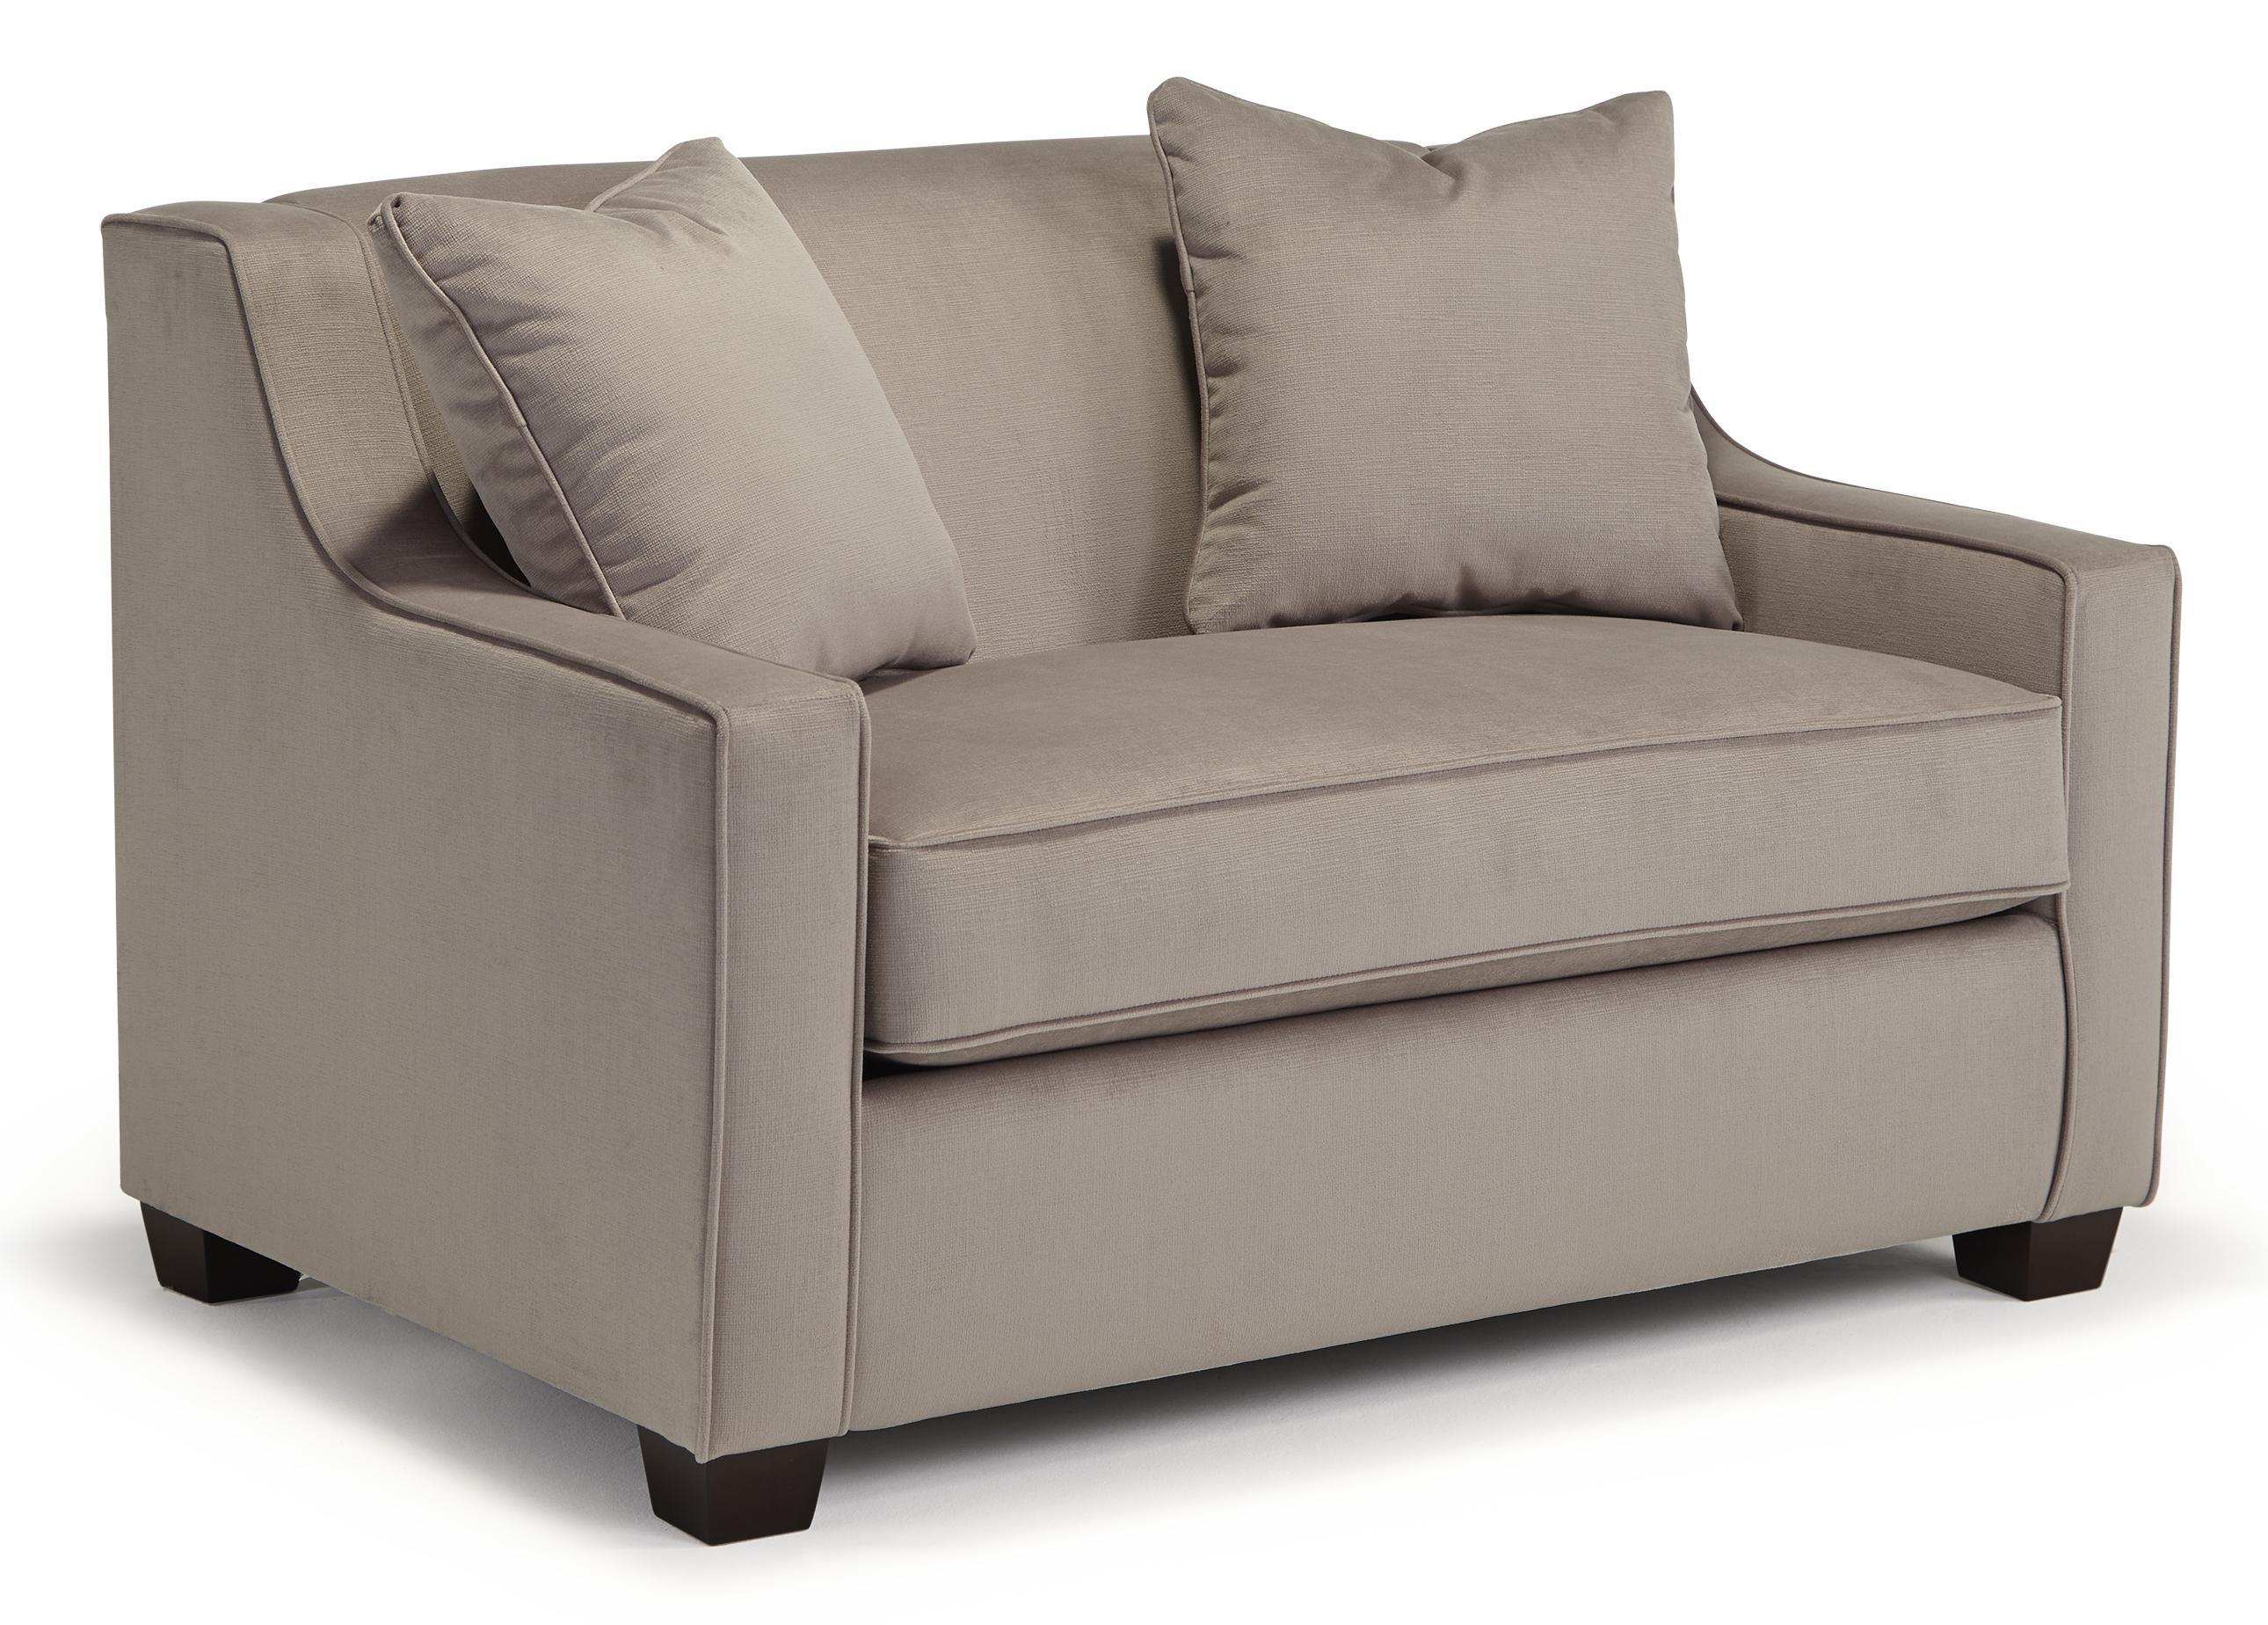 Marinette Twin Sleeper Chair w/ Memory Foam Mattress by Bravo Furniture at Bennett's Furniture and Mattresses